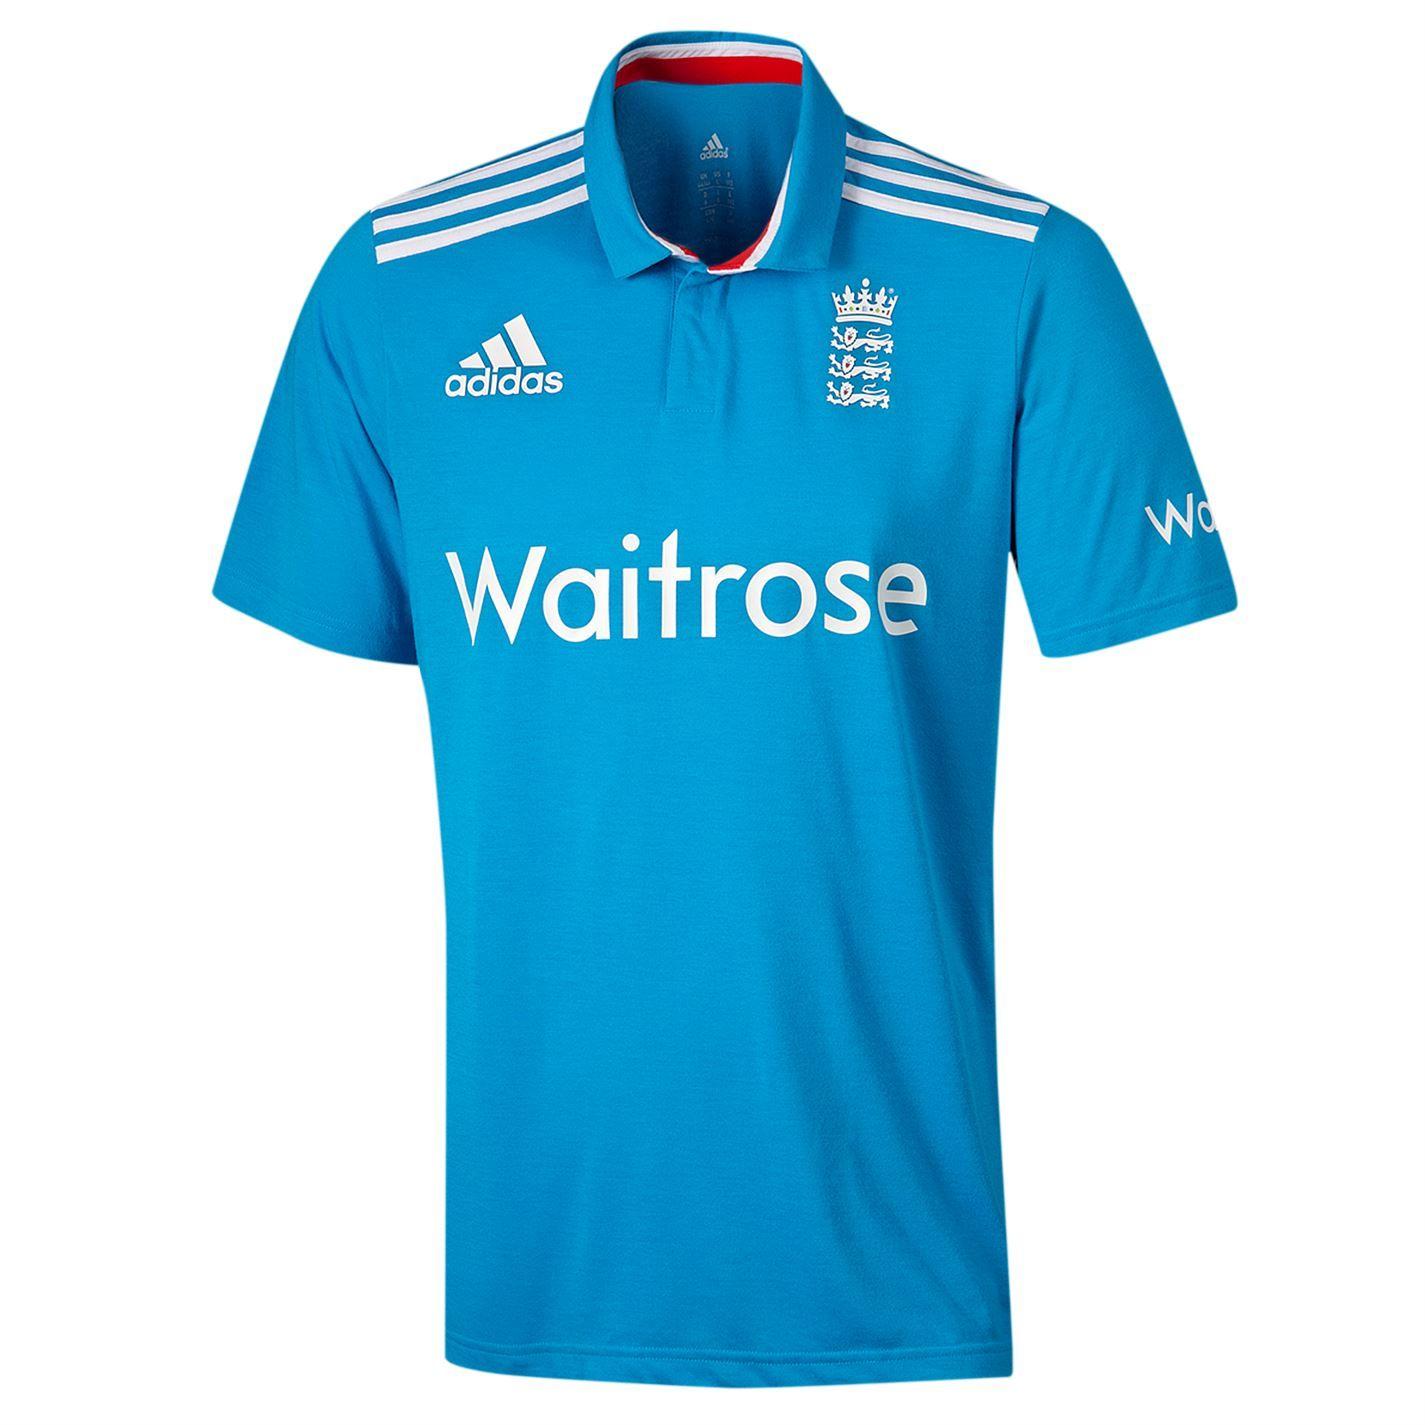 adidas Howzat Long Sleeve Kids Cricket Whites Polo Shirt Top Jersey White